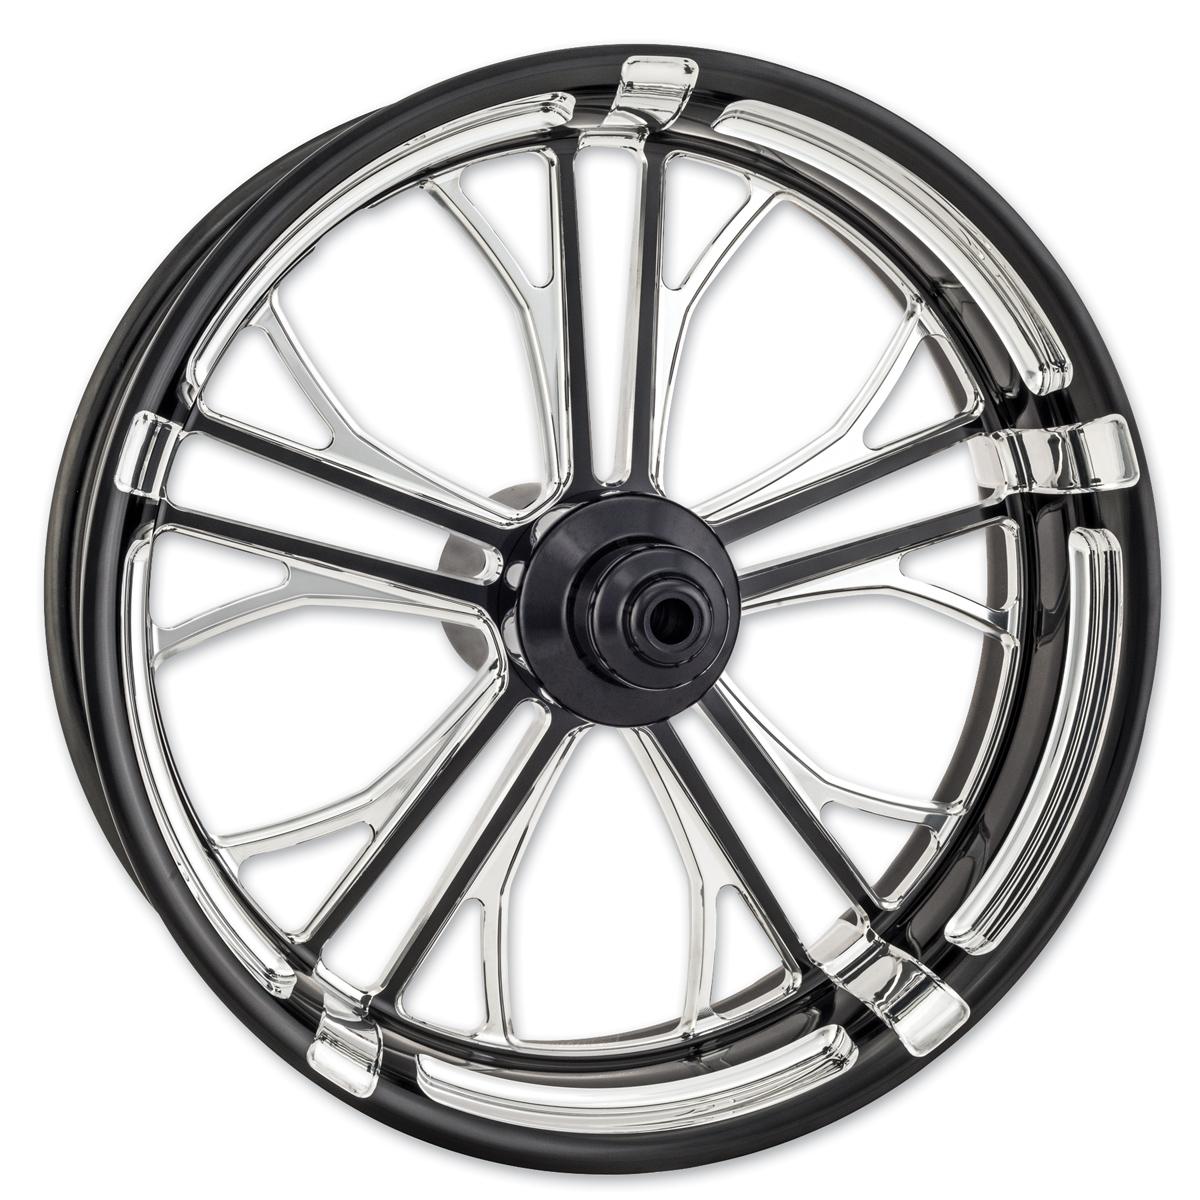 Performance Machine Dixon Platinum Cut Front Wheel 18x3.5 ABS